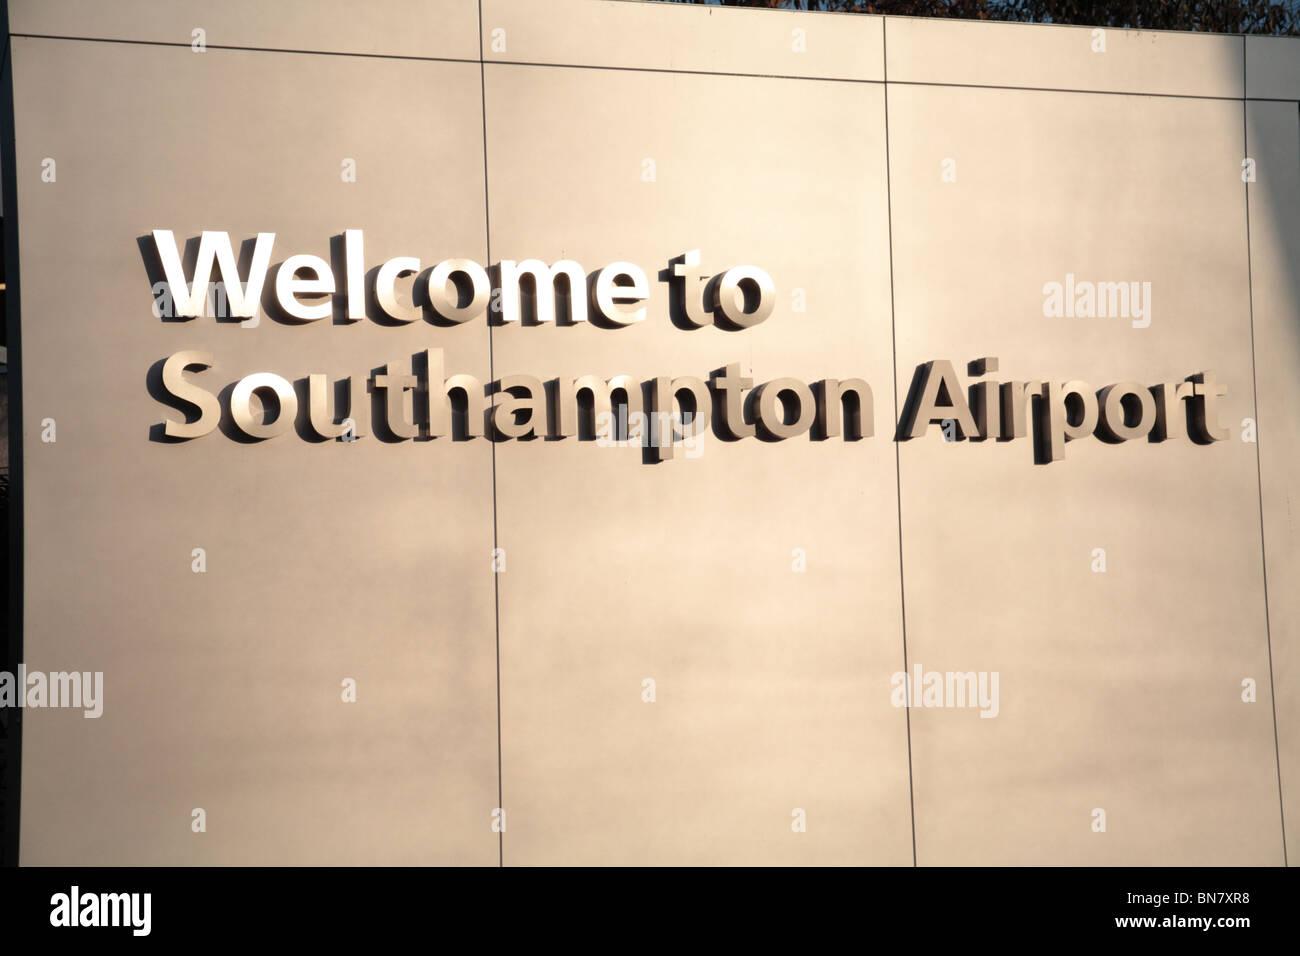 Southampton Airport sign Stock Photo